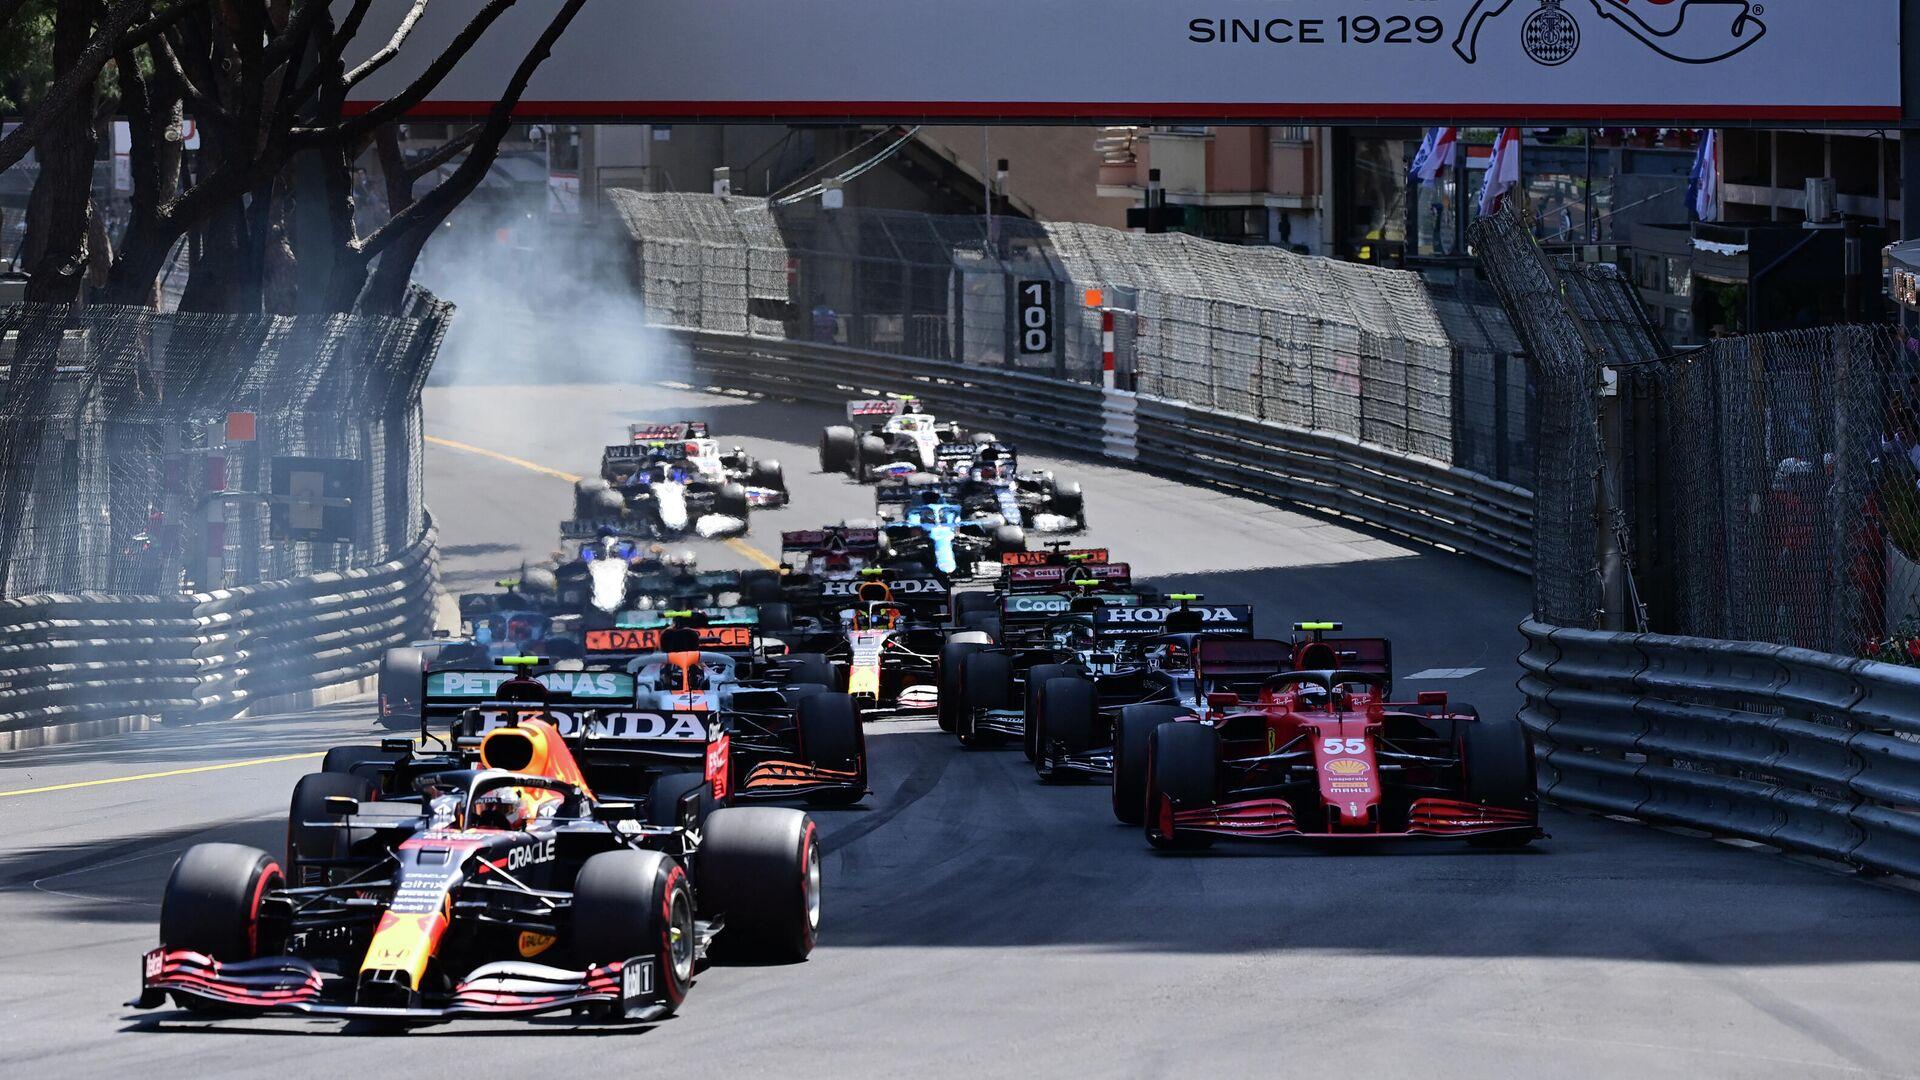 Старт гонки Гран-при Монако Формулы-1 - РИА Новости, 1920, 24.05.2021